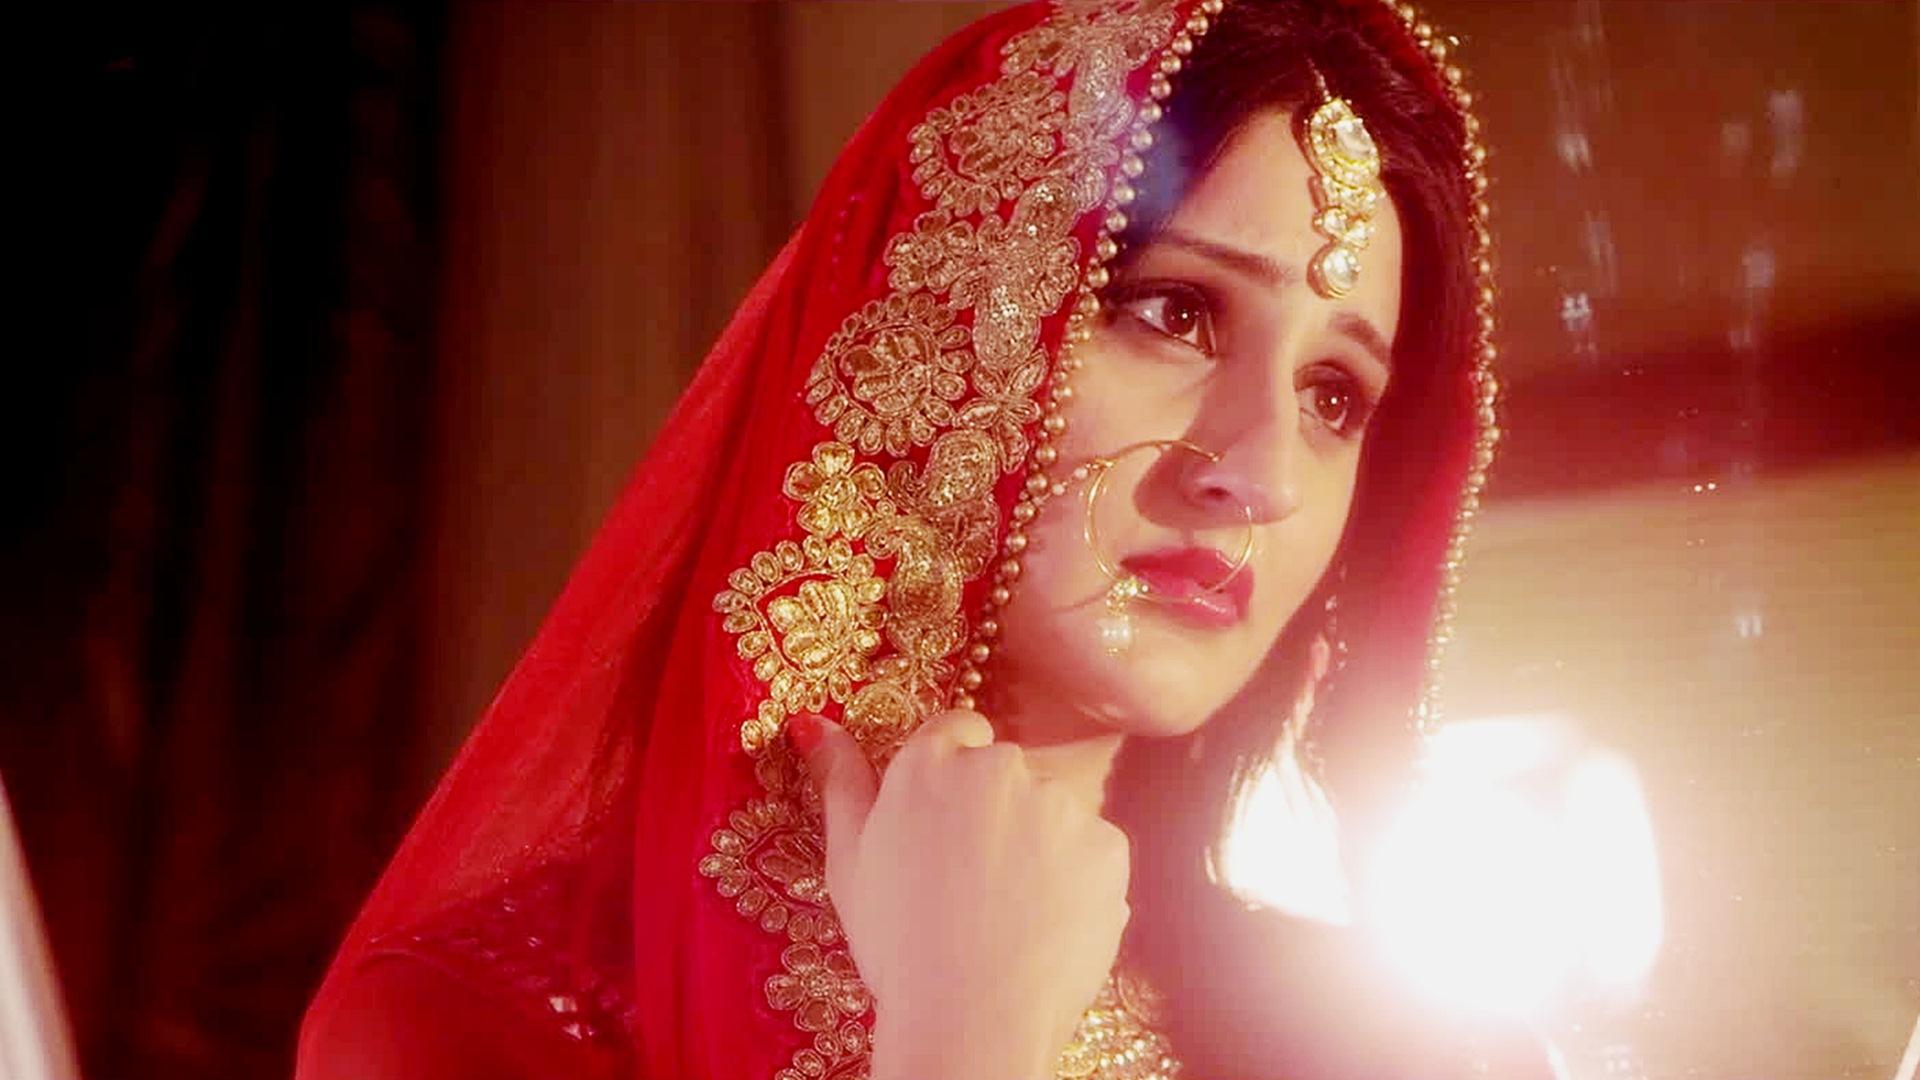 Cute Indian Bride Girl Wallpaper Cute Wedding Indian Girl 1920x1080 Wallpaper Teahub Io